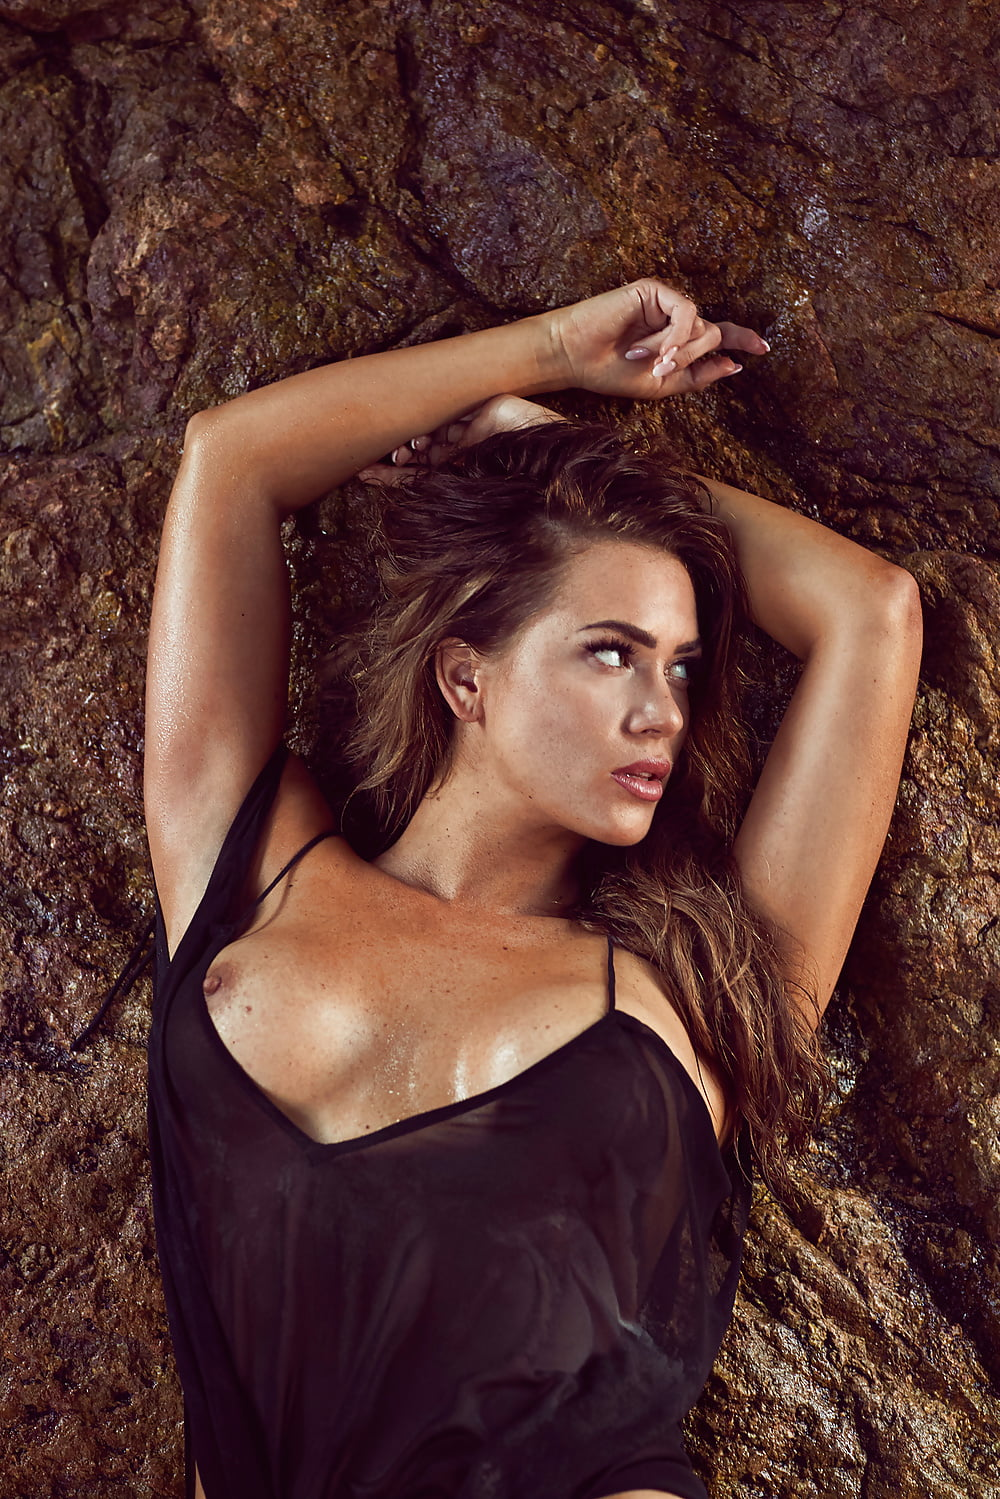 Jessica paszka playboy nude